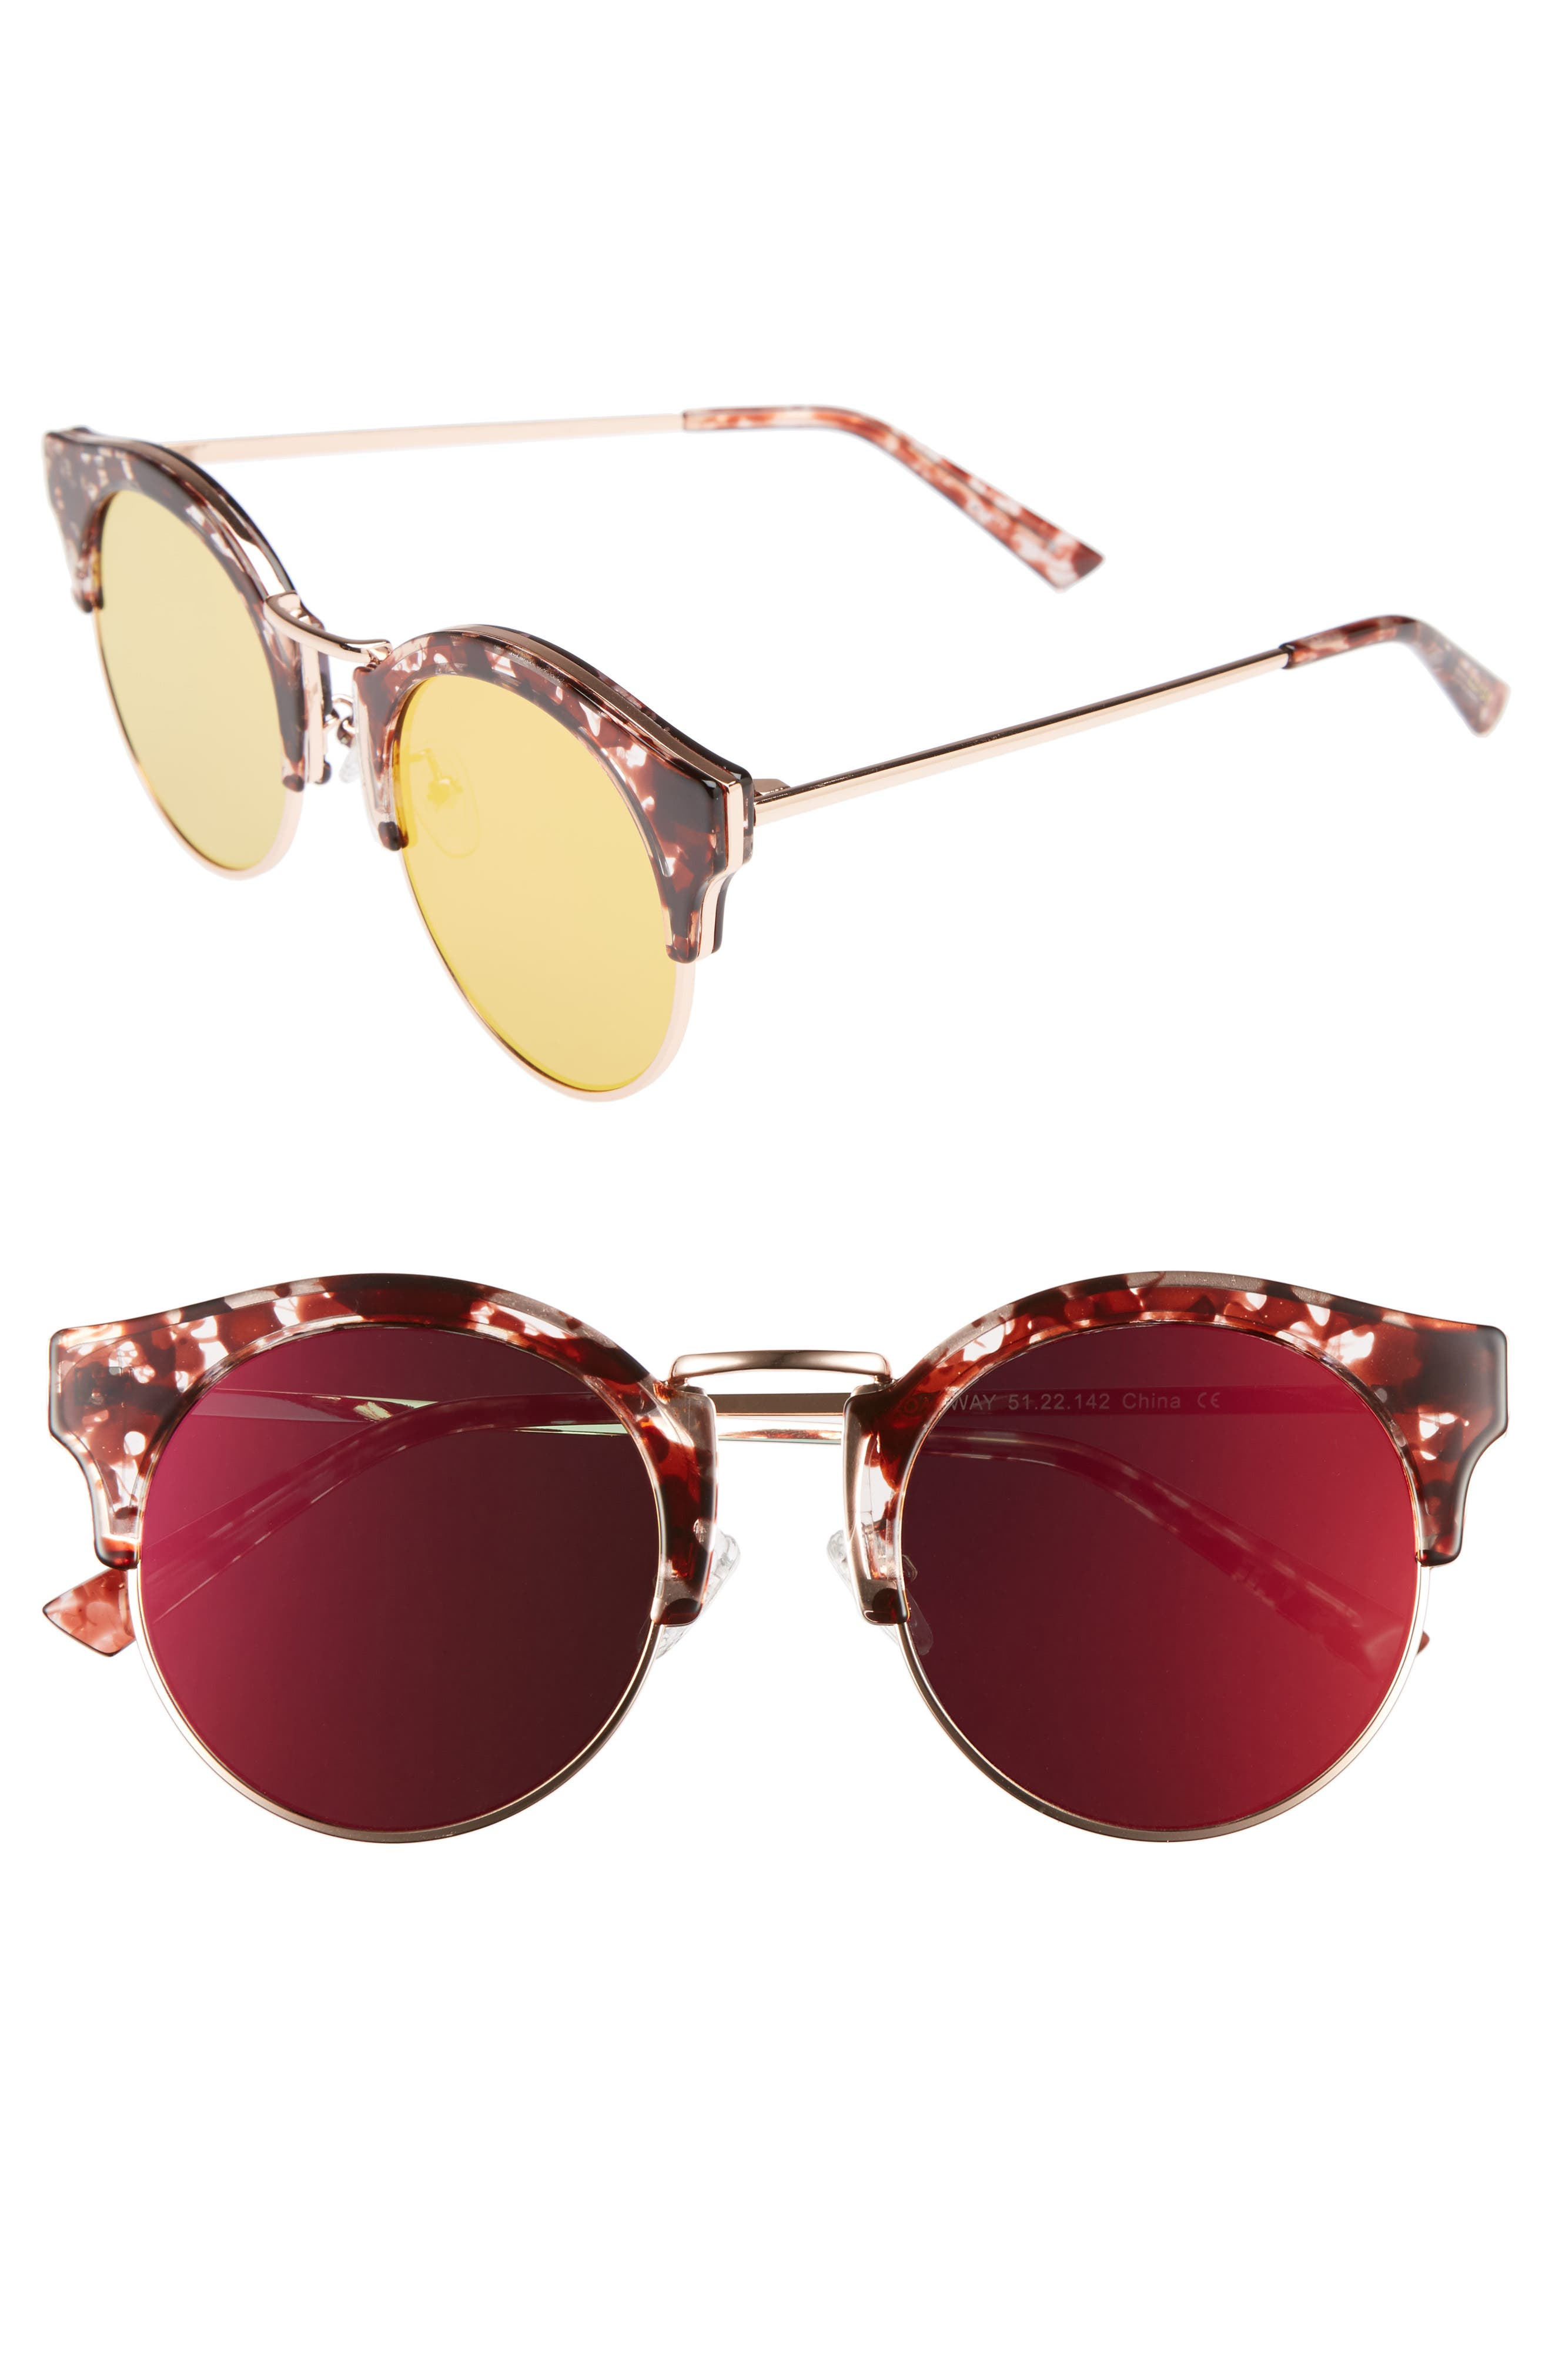 Broadway 51mm Retro Sunglasses,                             Main thumbnail 3, color,